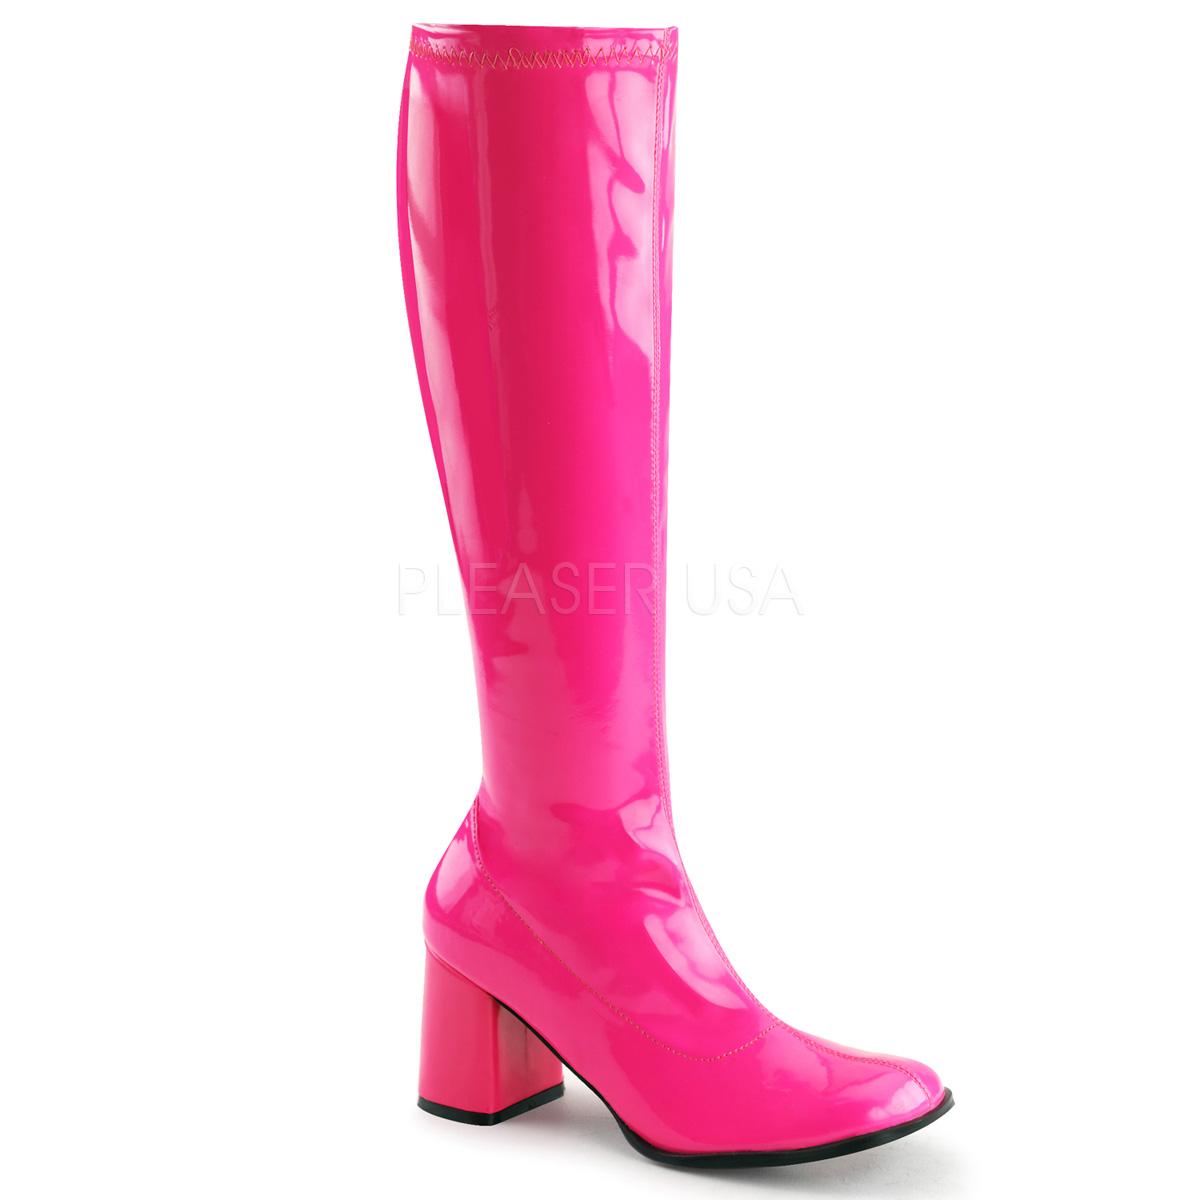 gogo 300uv 3 inch heel knee high boot walmart